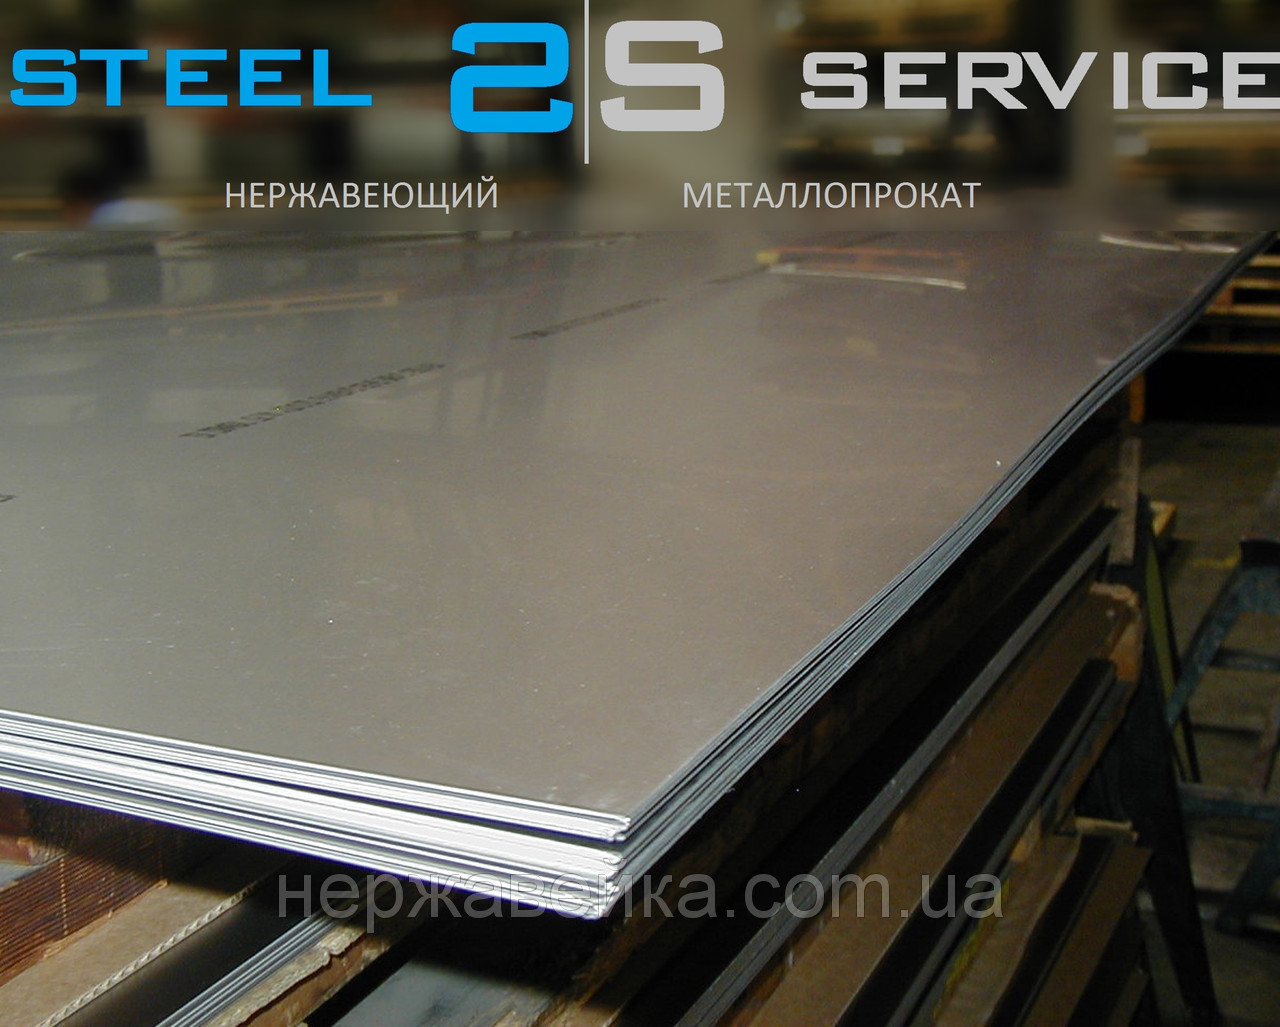 Листовая нержавейка 0,4х1250х2500мм AISI 430(12Х17) 2B - матовый, технический